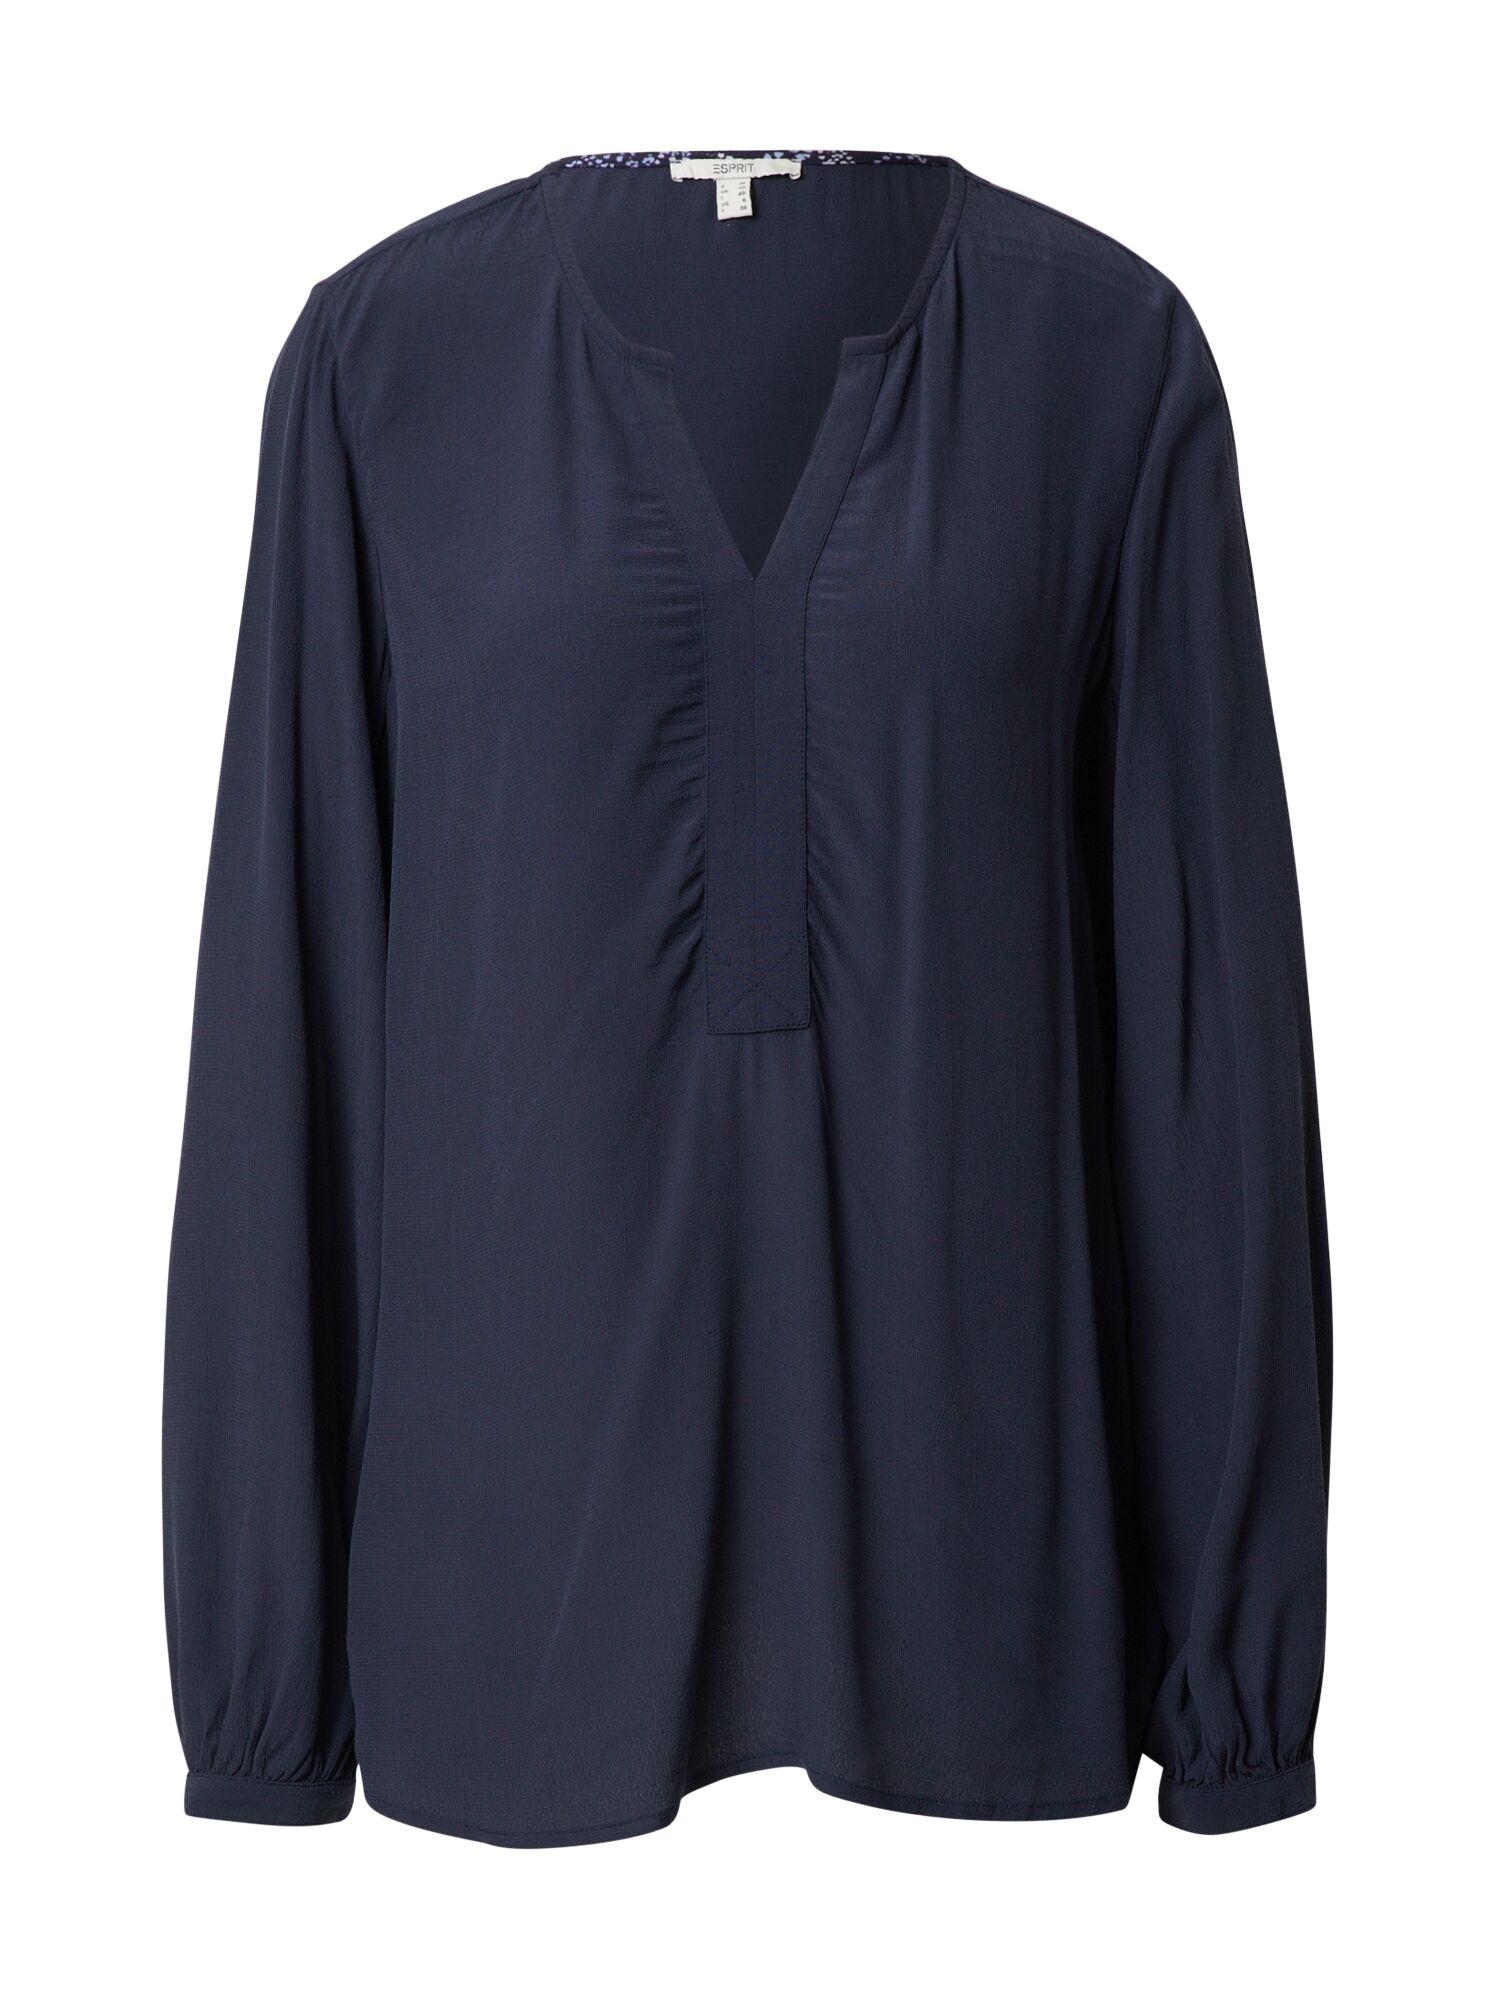 Esprit Chemisier 'Marocain'  - Bleu - Taille: 38 - female